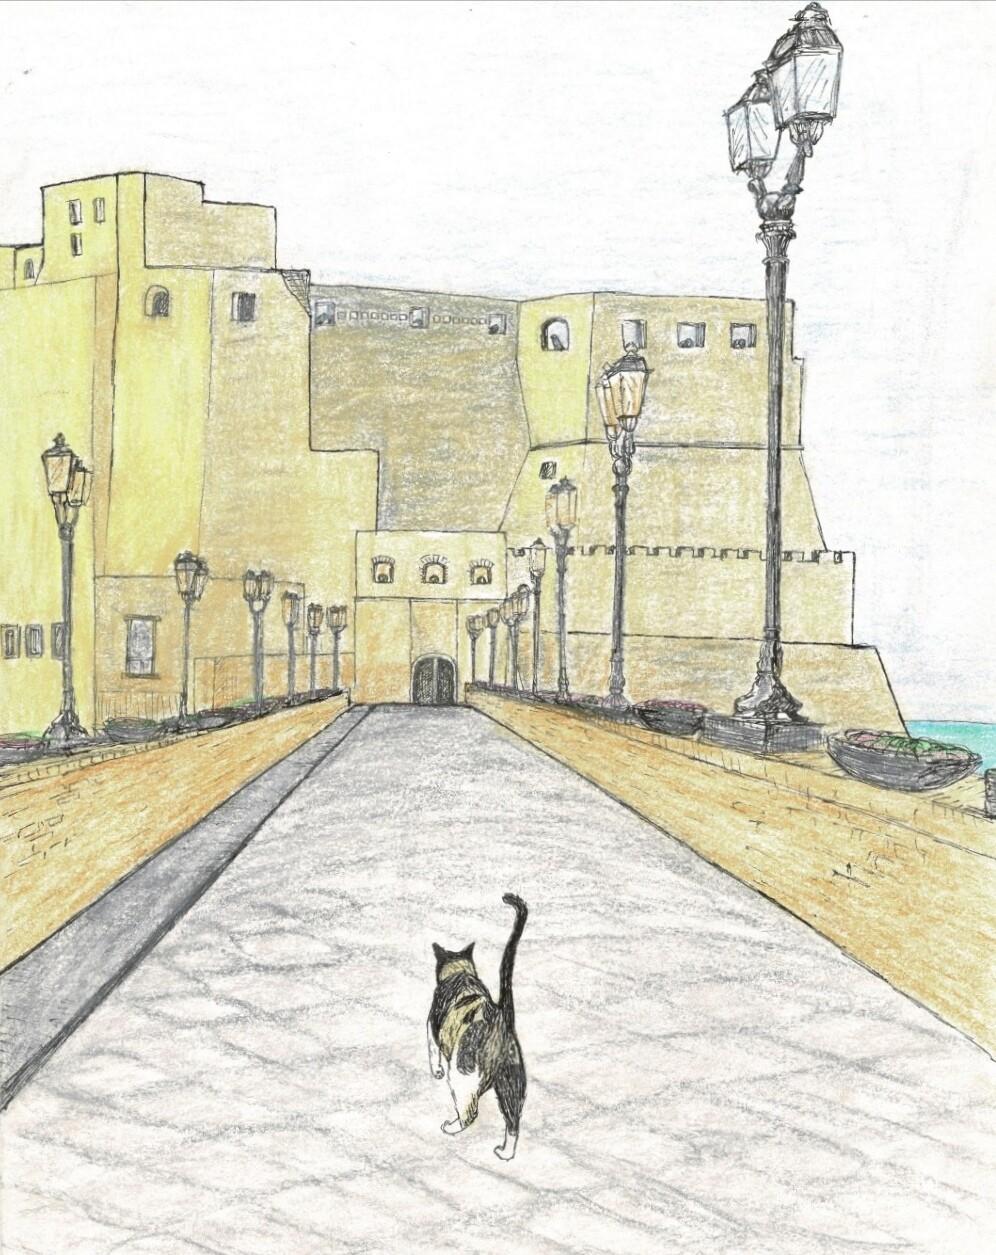 Verdwaald in Napels -- Castel dell'Ovo geïllustreerd door Leny Boerstra